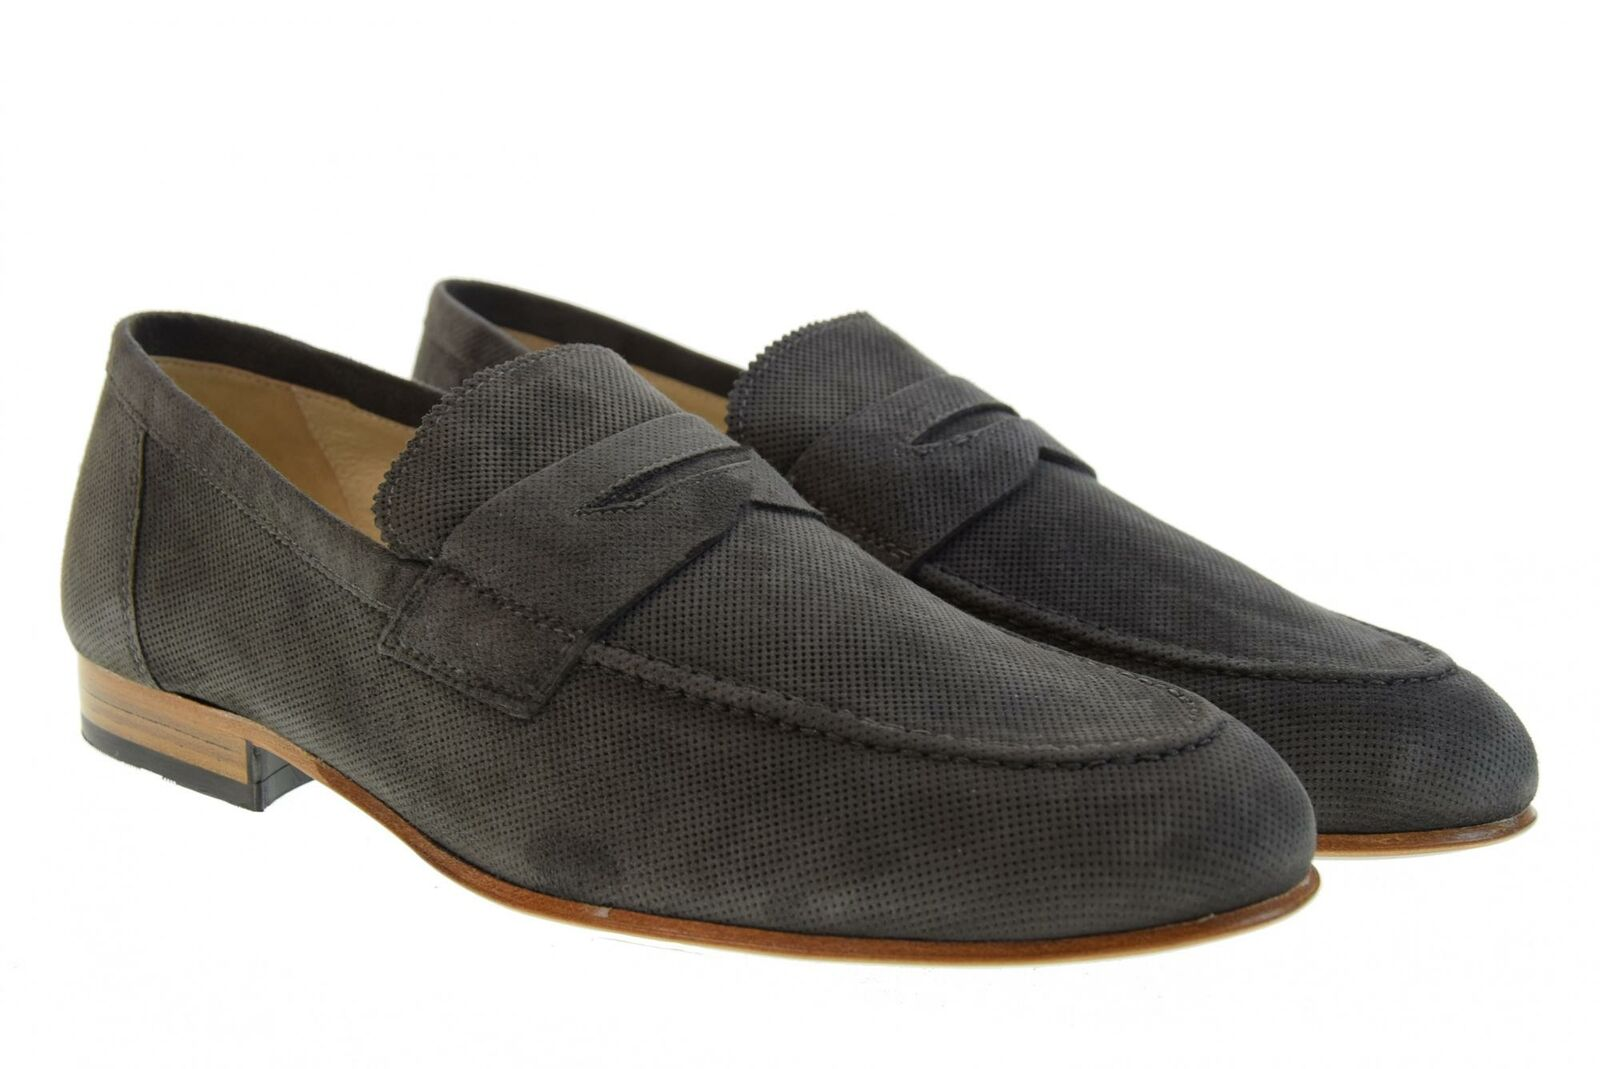 negro Giardini P19u hombres zapatos moccasins P900885U   105